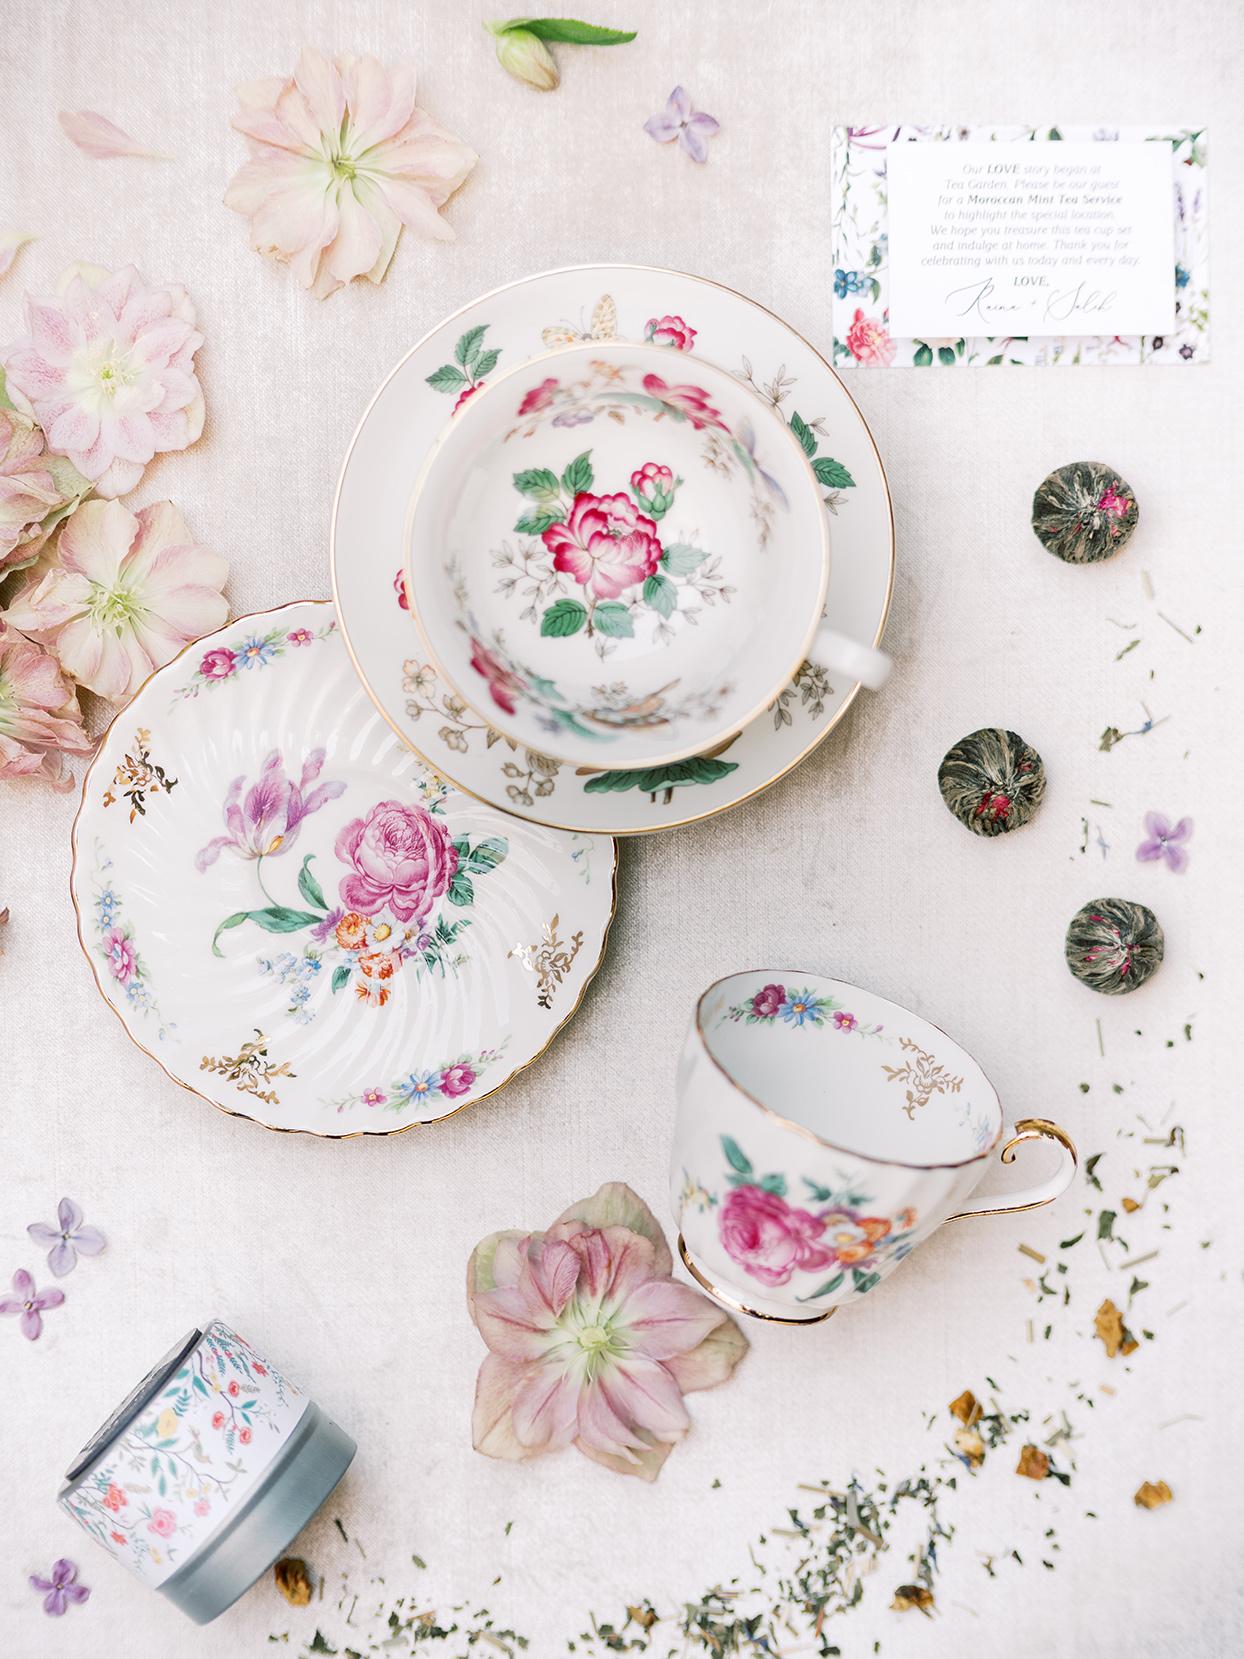 raina salih wedding favors fine china plates and cups